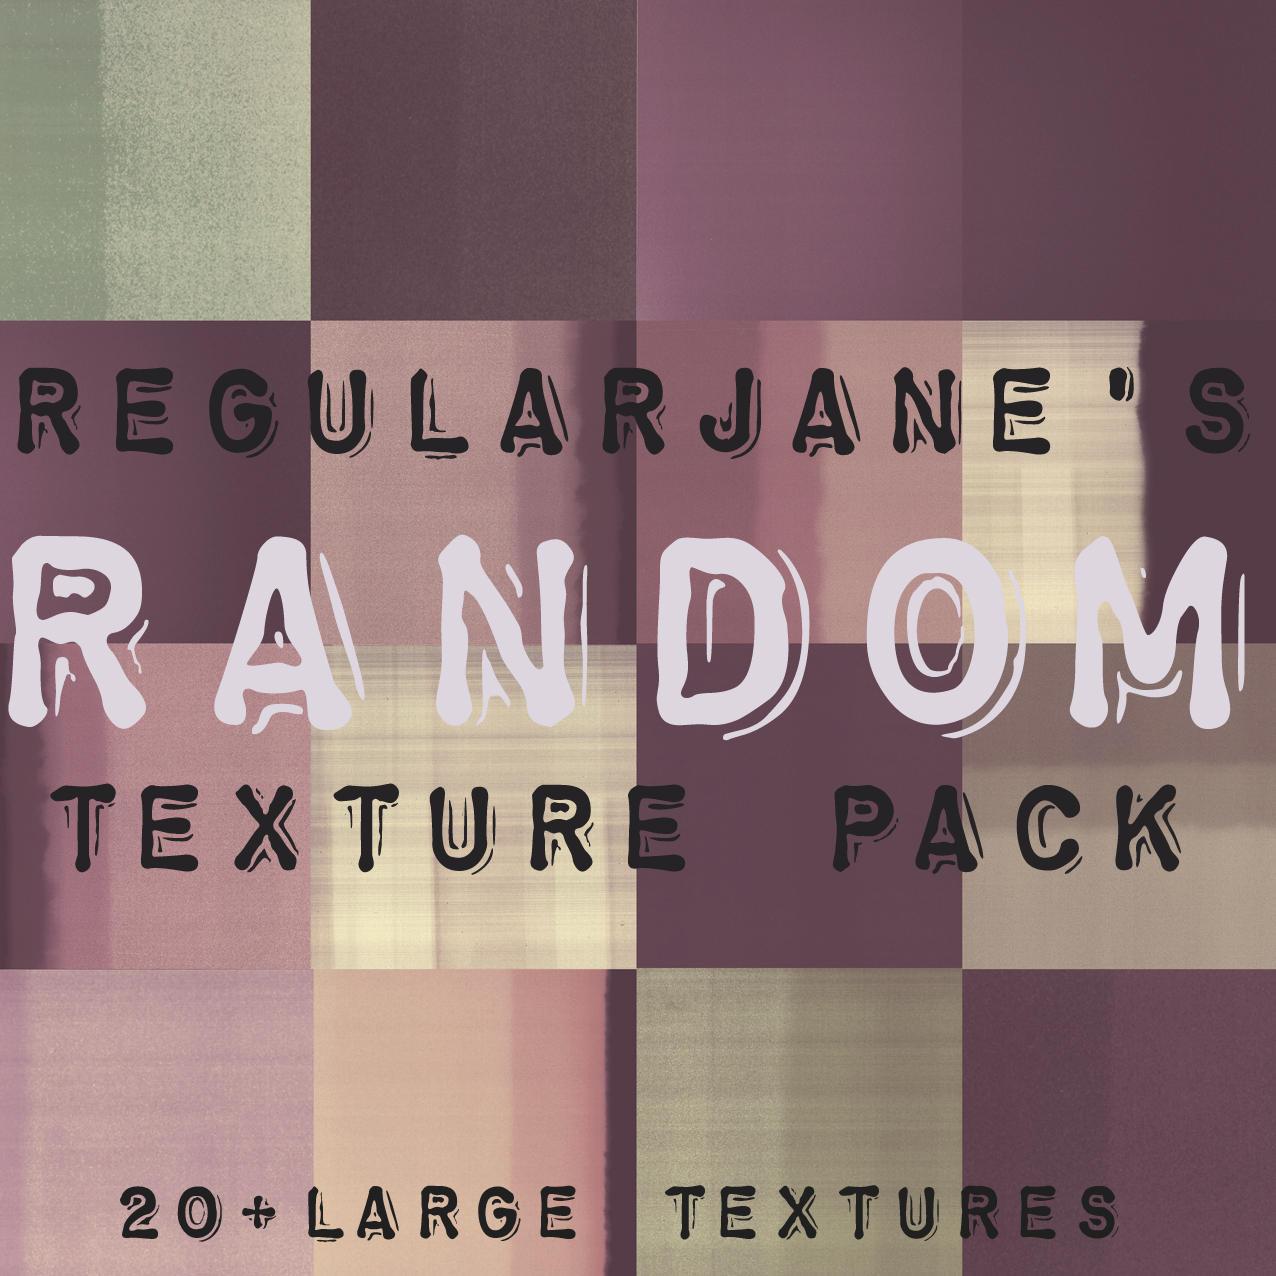 Random Texture Pack 001 by regularjane